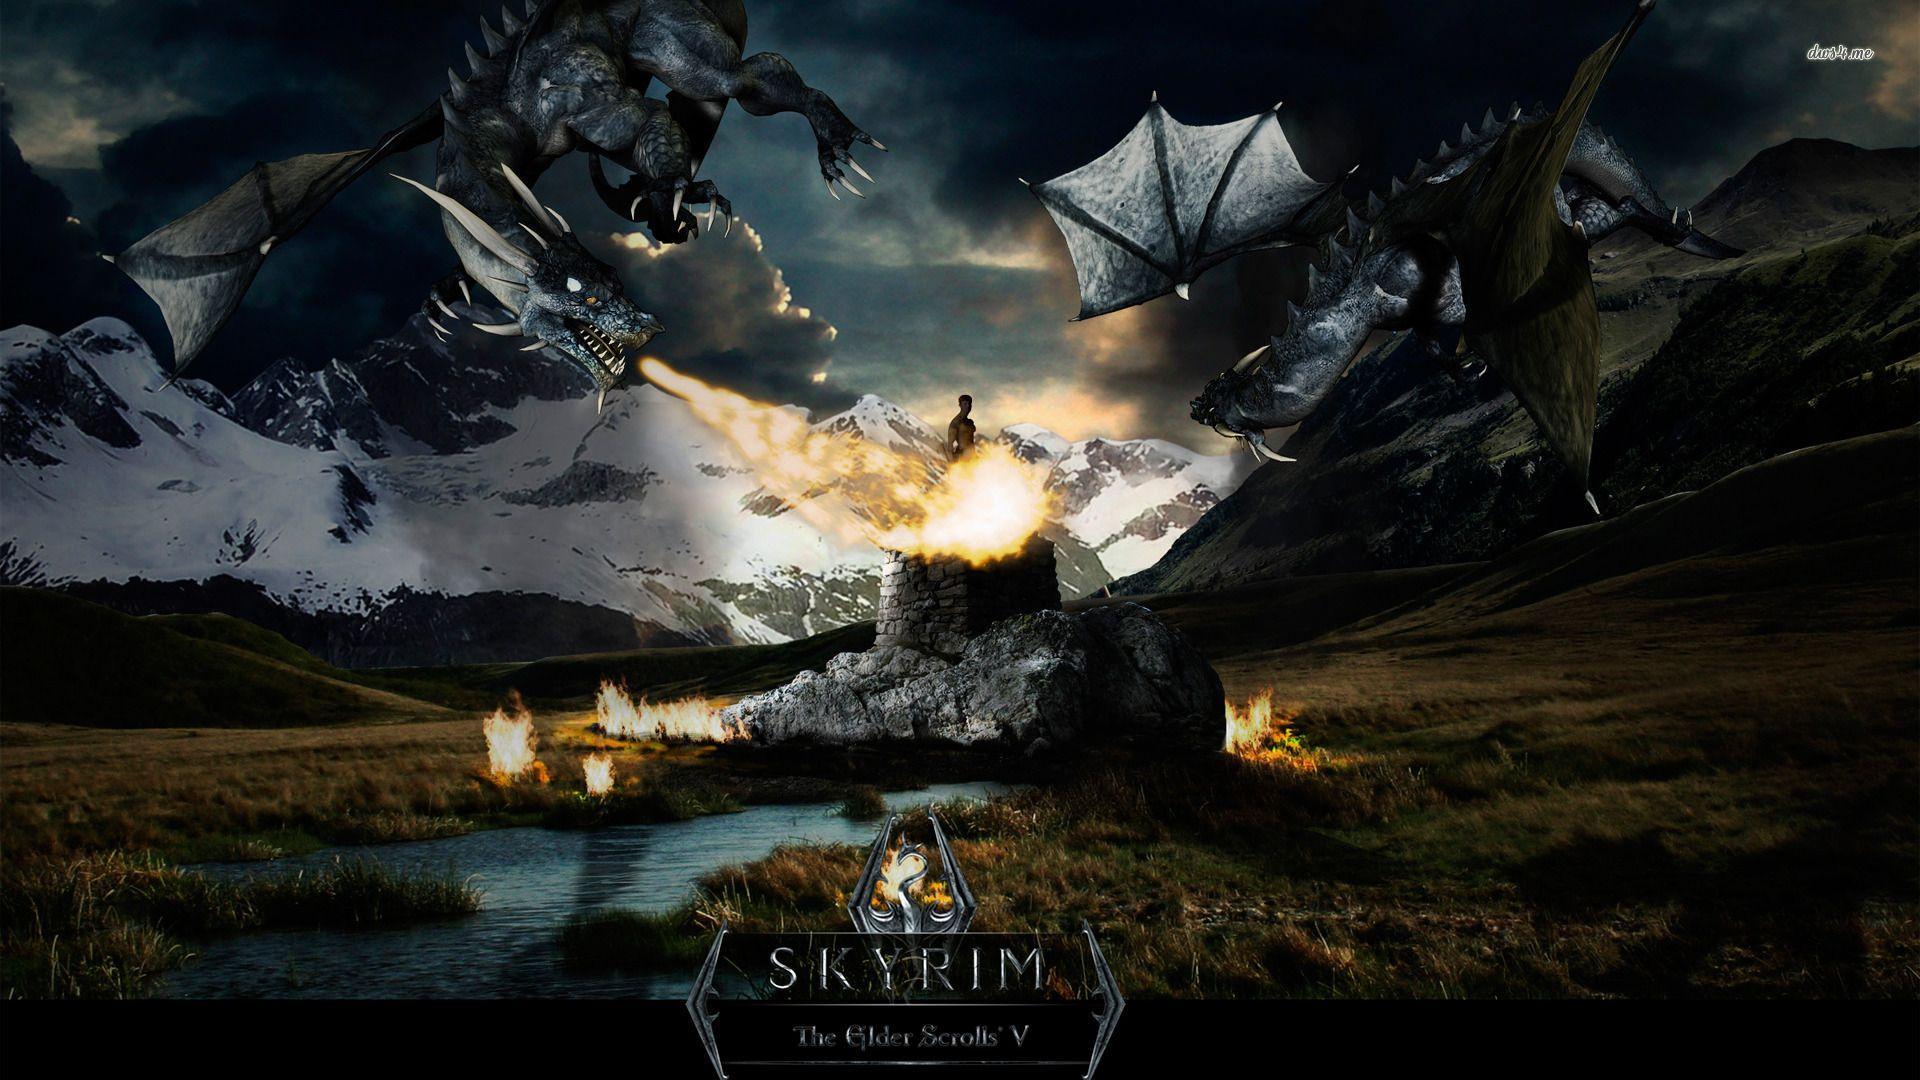 The Elder Scrolls V: Skyrim Wallpapers - Wallpaper Cave